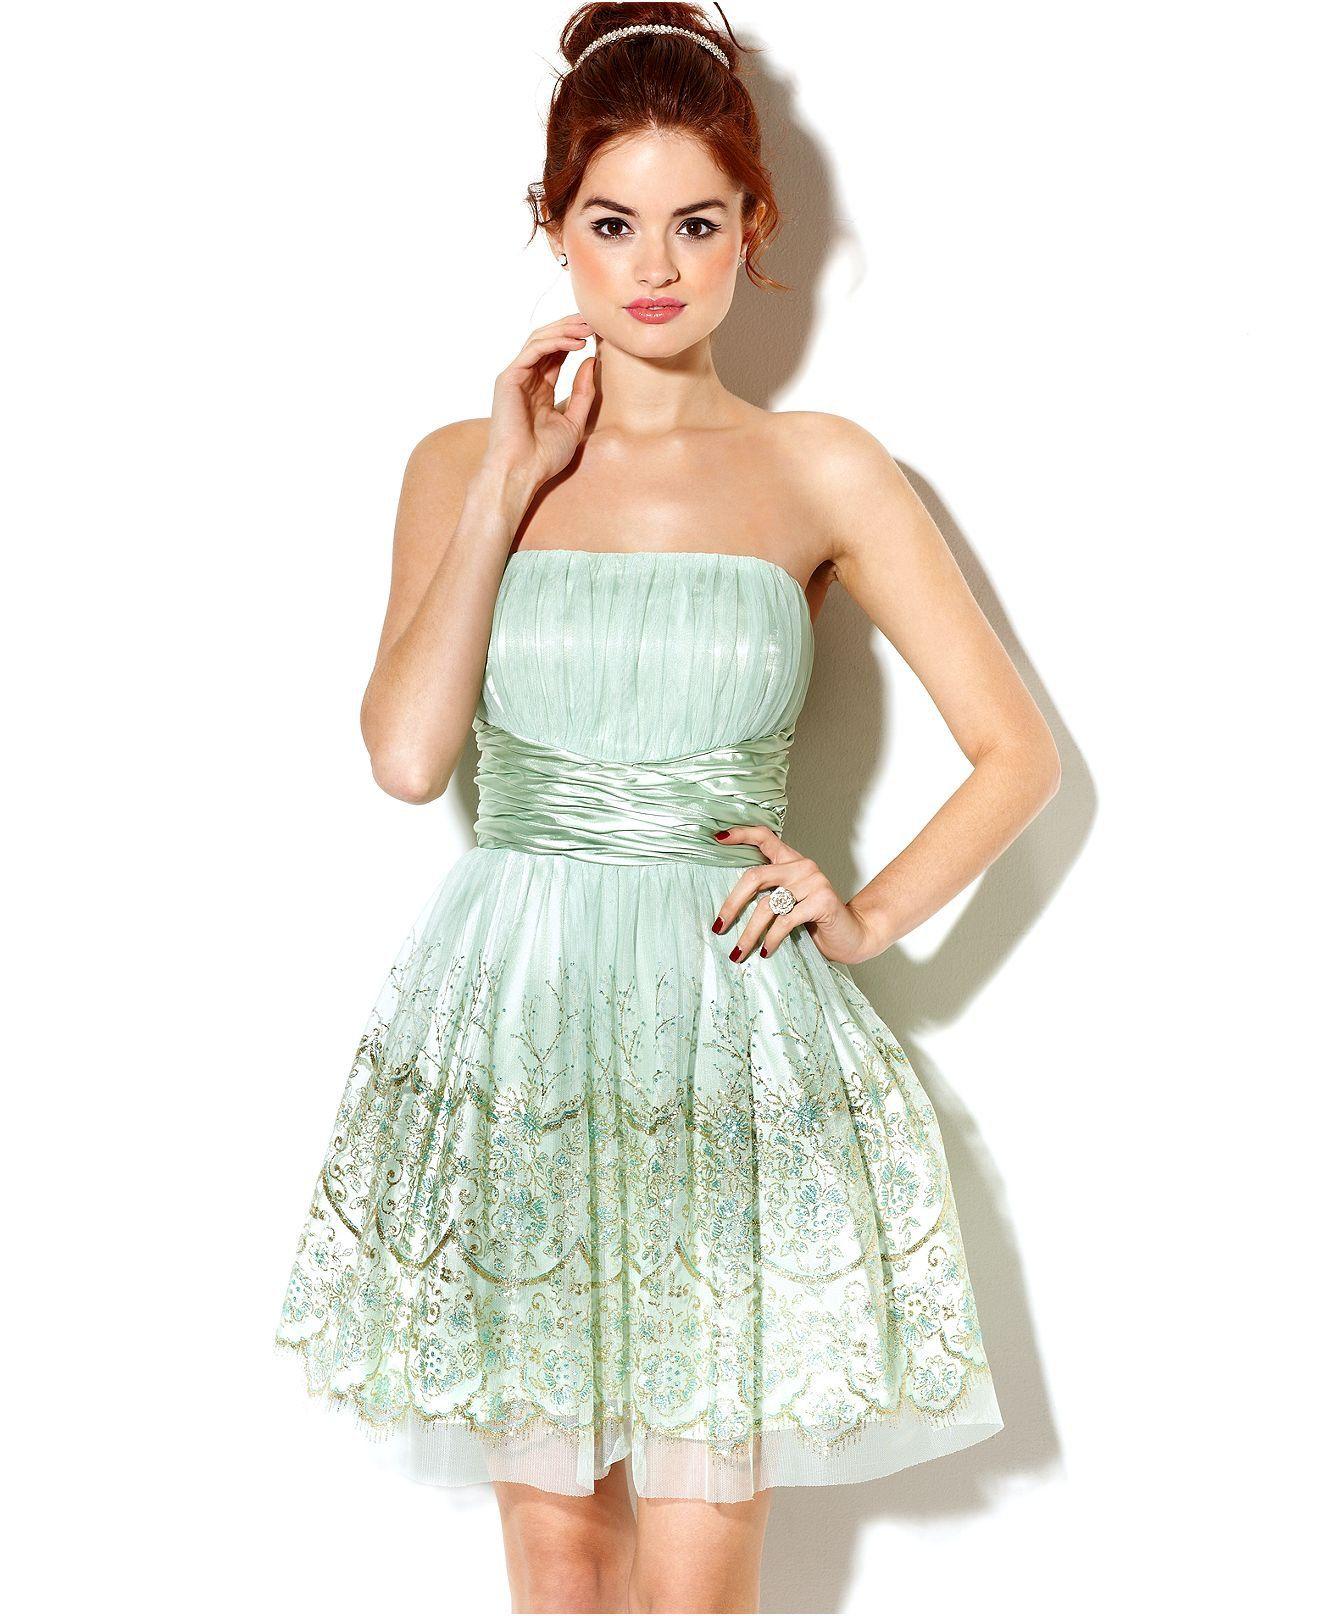 Macyus dresses dress strapless glitter aline juniors